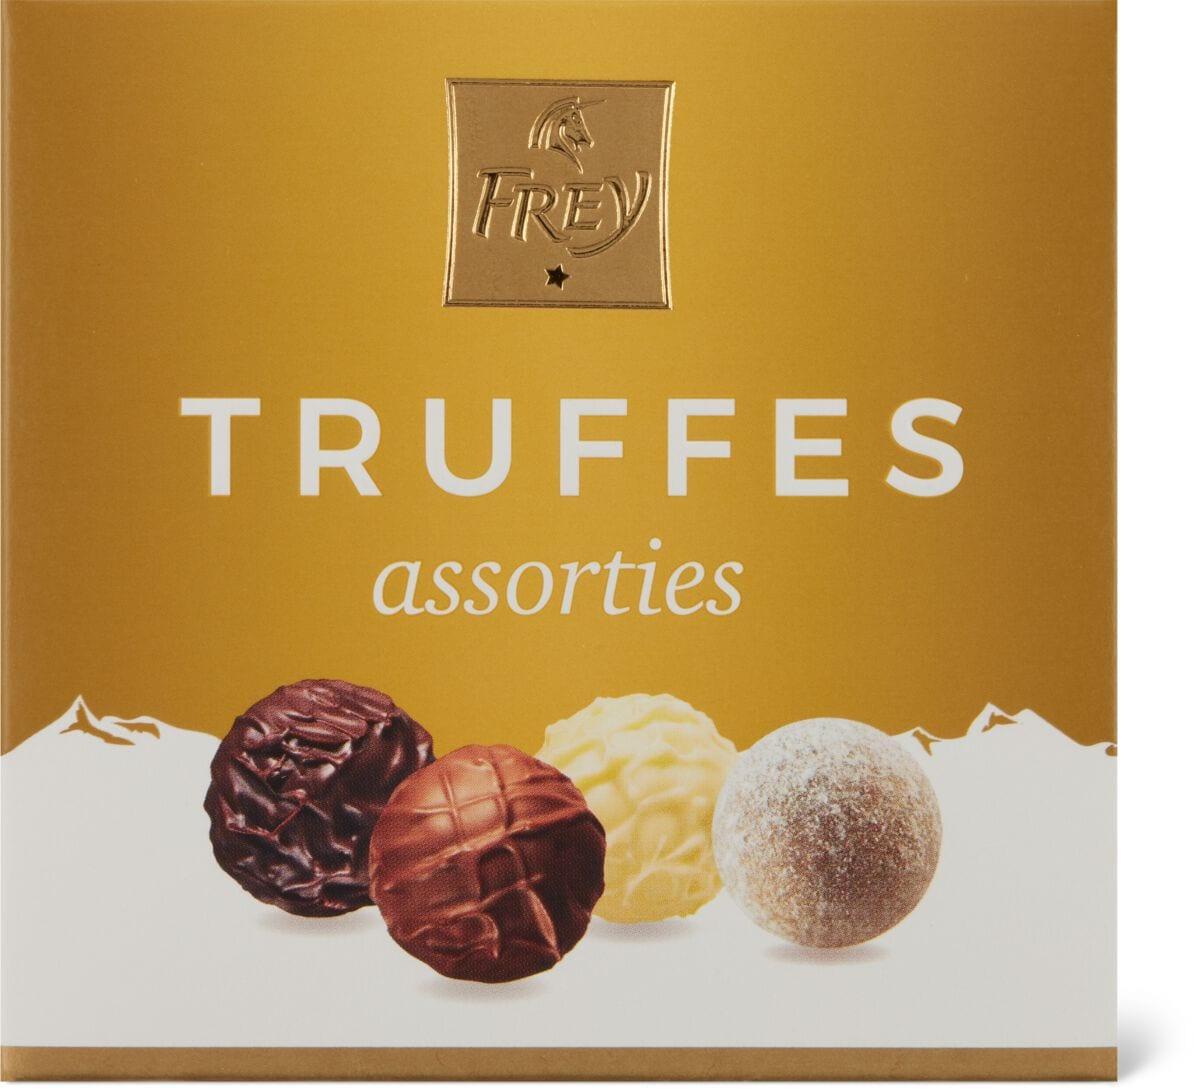 Frey Truffes assortiti, 49g